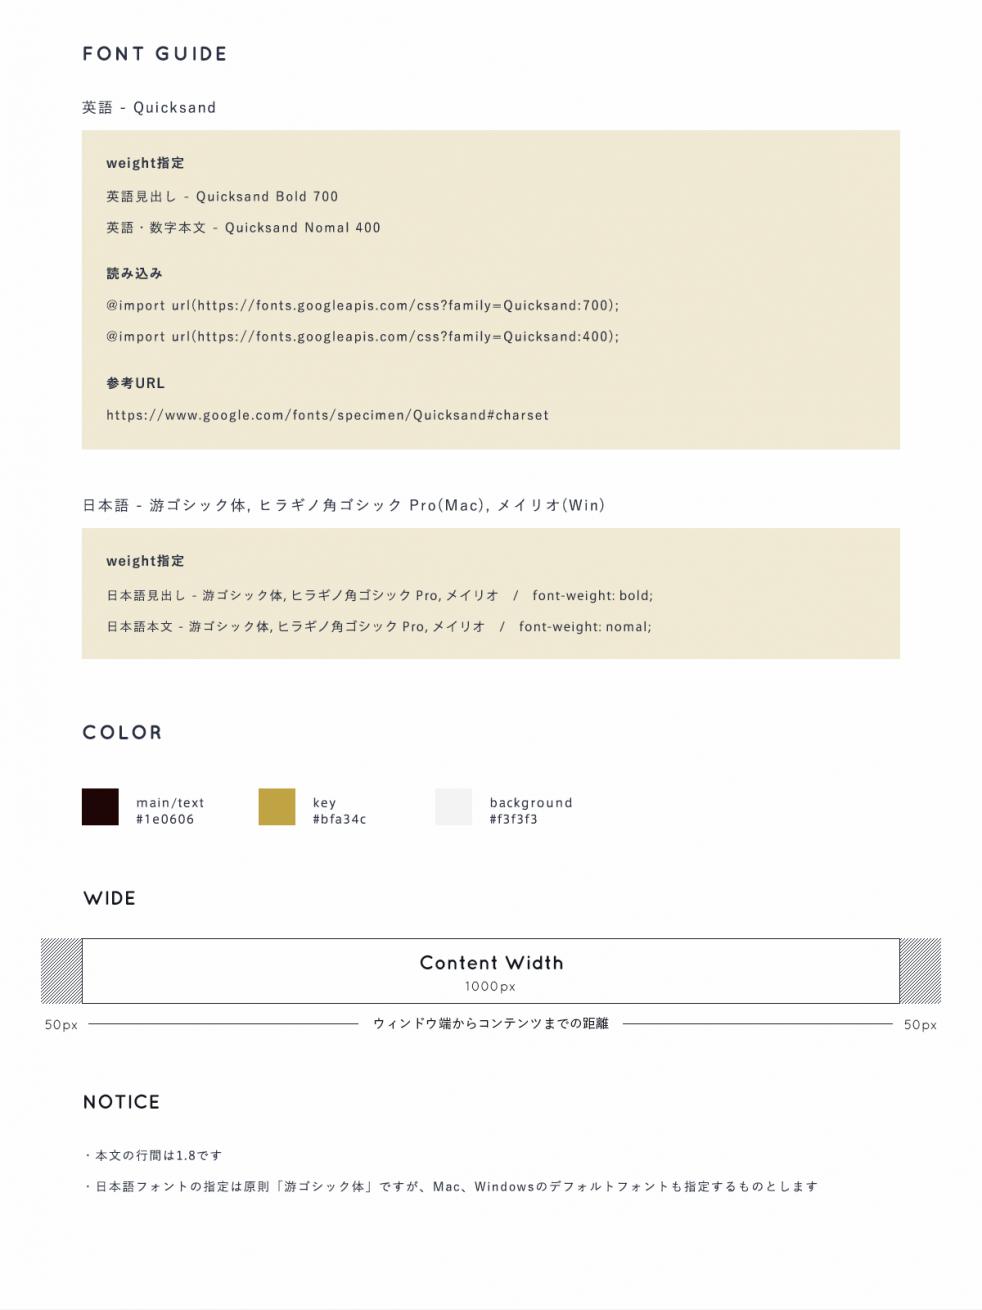 designguide-sample